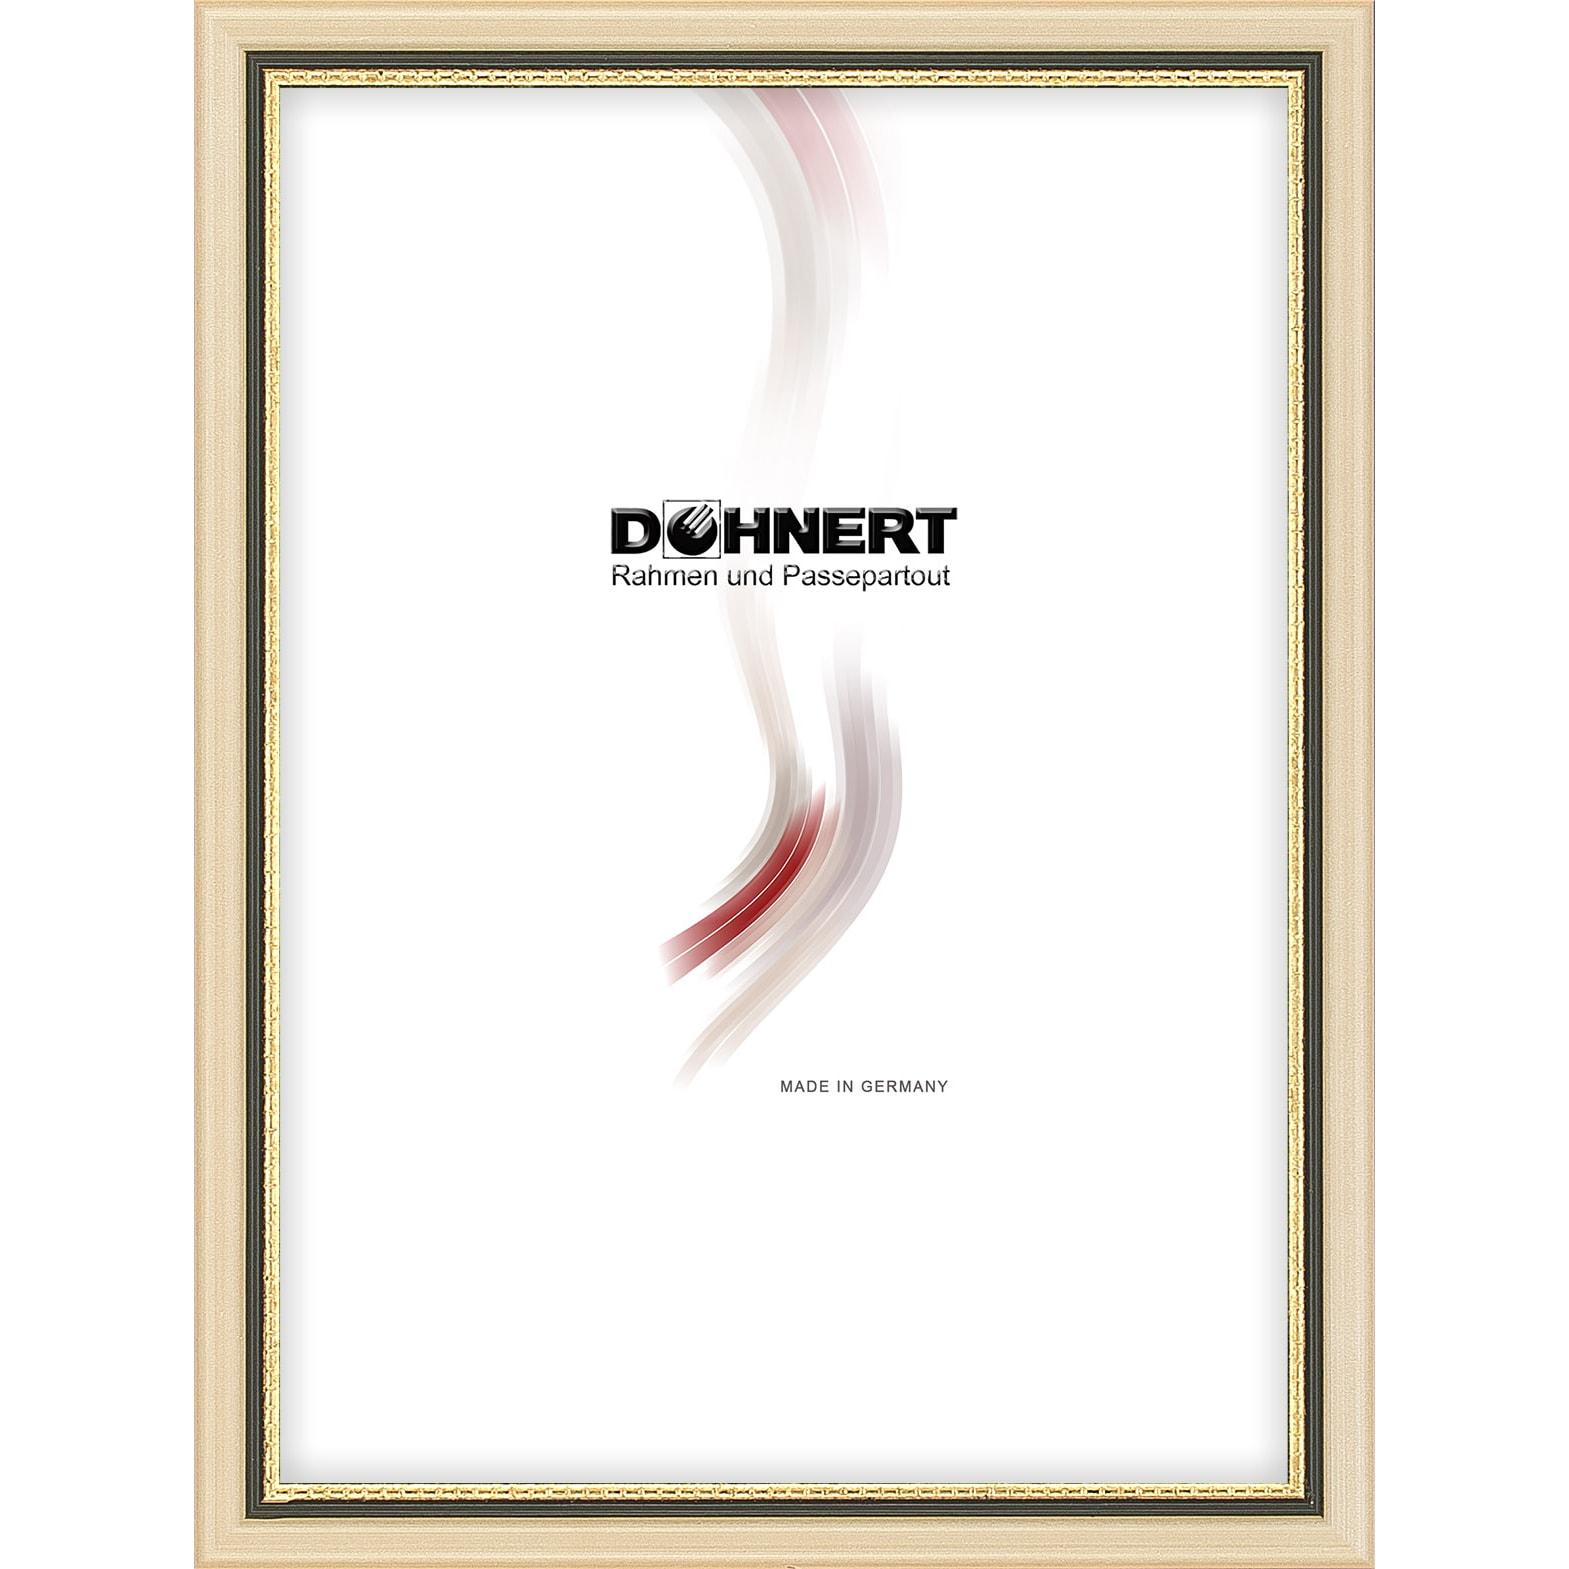 Grote Lijst Met Passepartout.Doehnert Lijst Van Hout Amersham 30x45 Cm Altweiss Mit Grau Gold